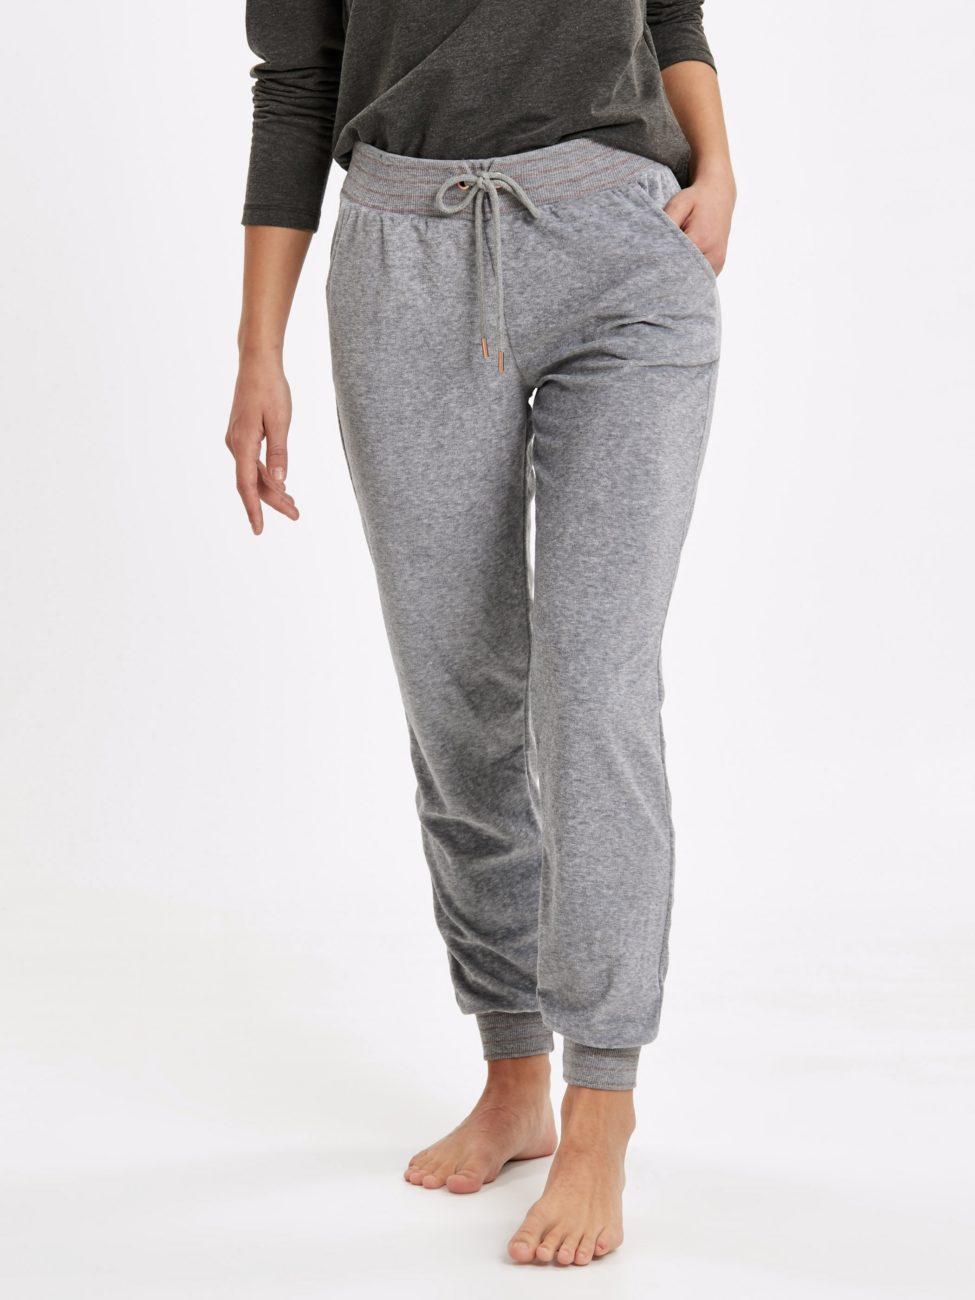 Soldes Lc Waikiki Maroc Pantalon Pyjama femme 49Dhs au lieu de 129Dhs